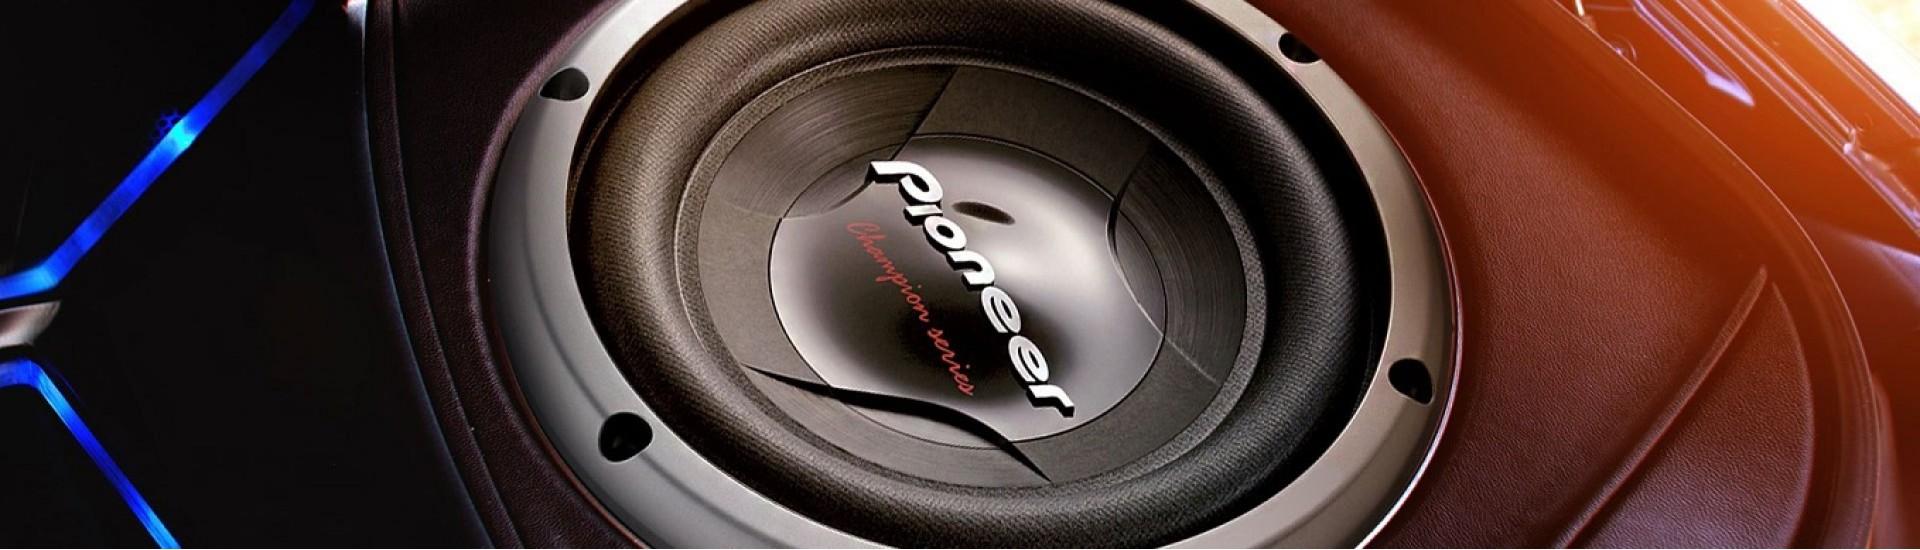 سیستم خودرو ، car audio and electronics